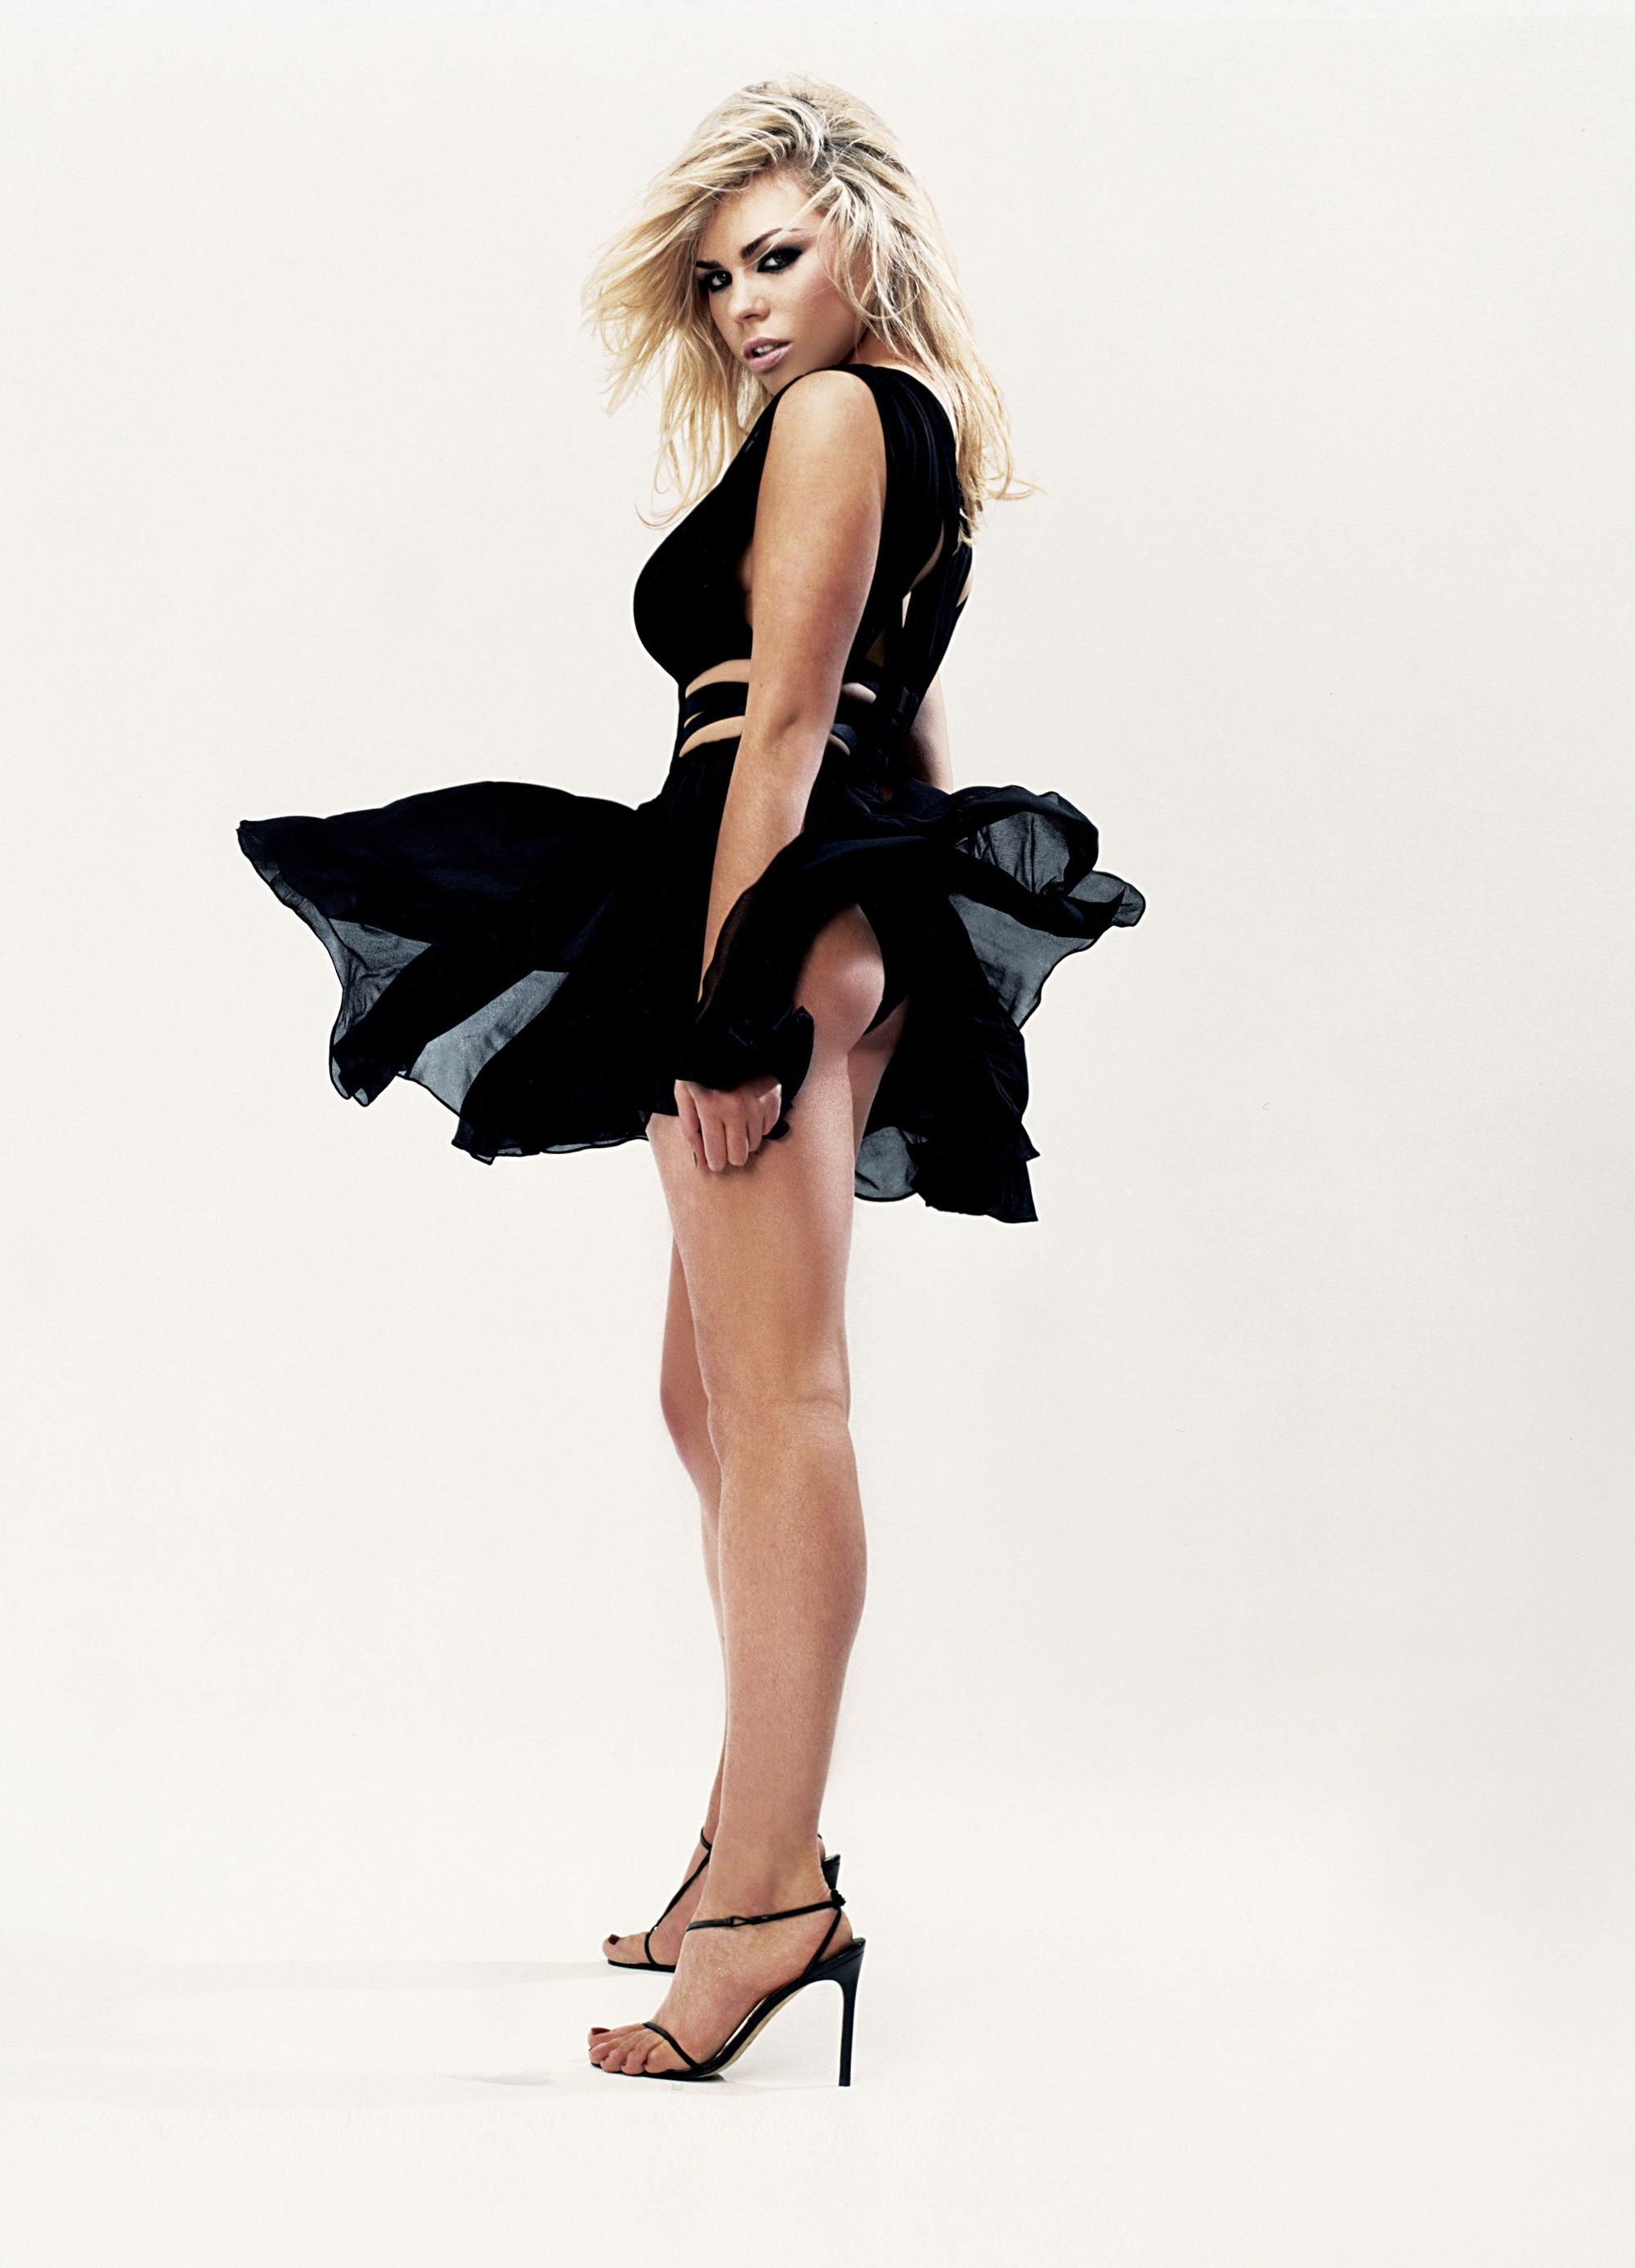 Billie Piper pics #2